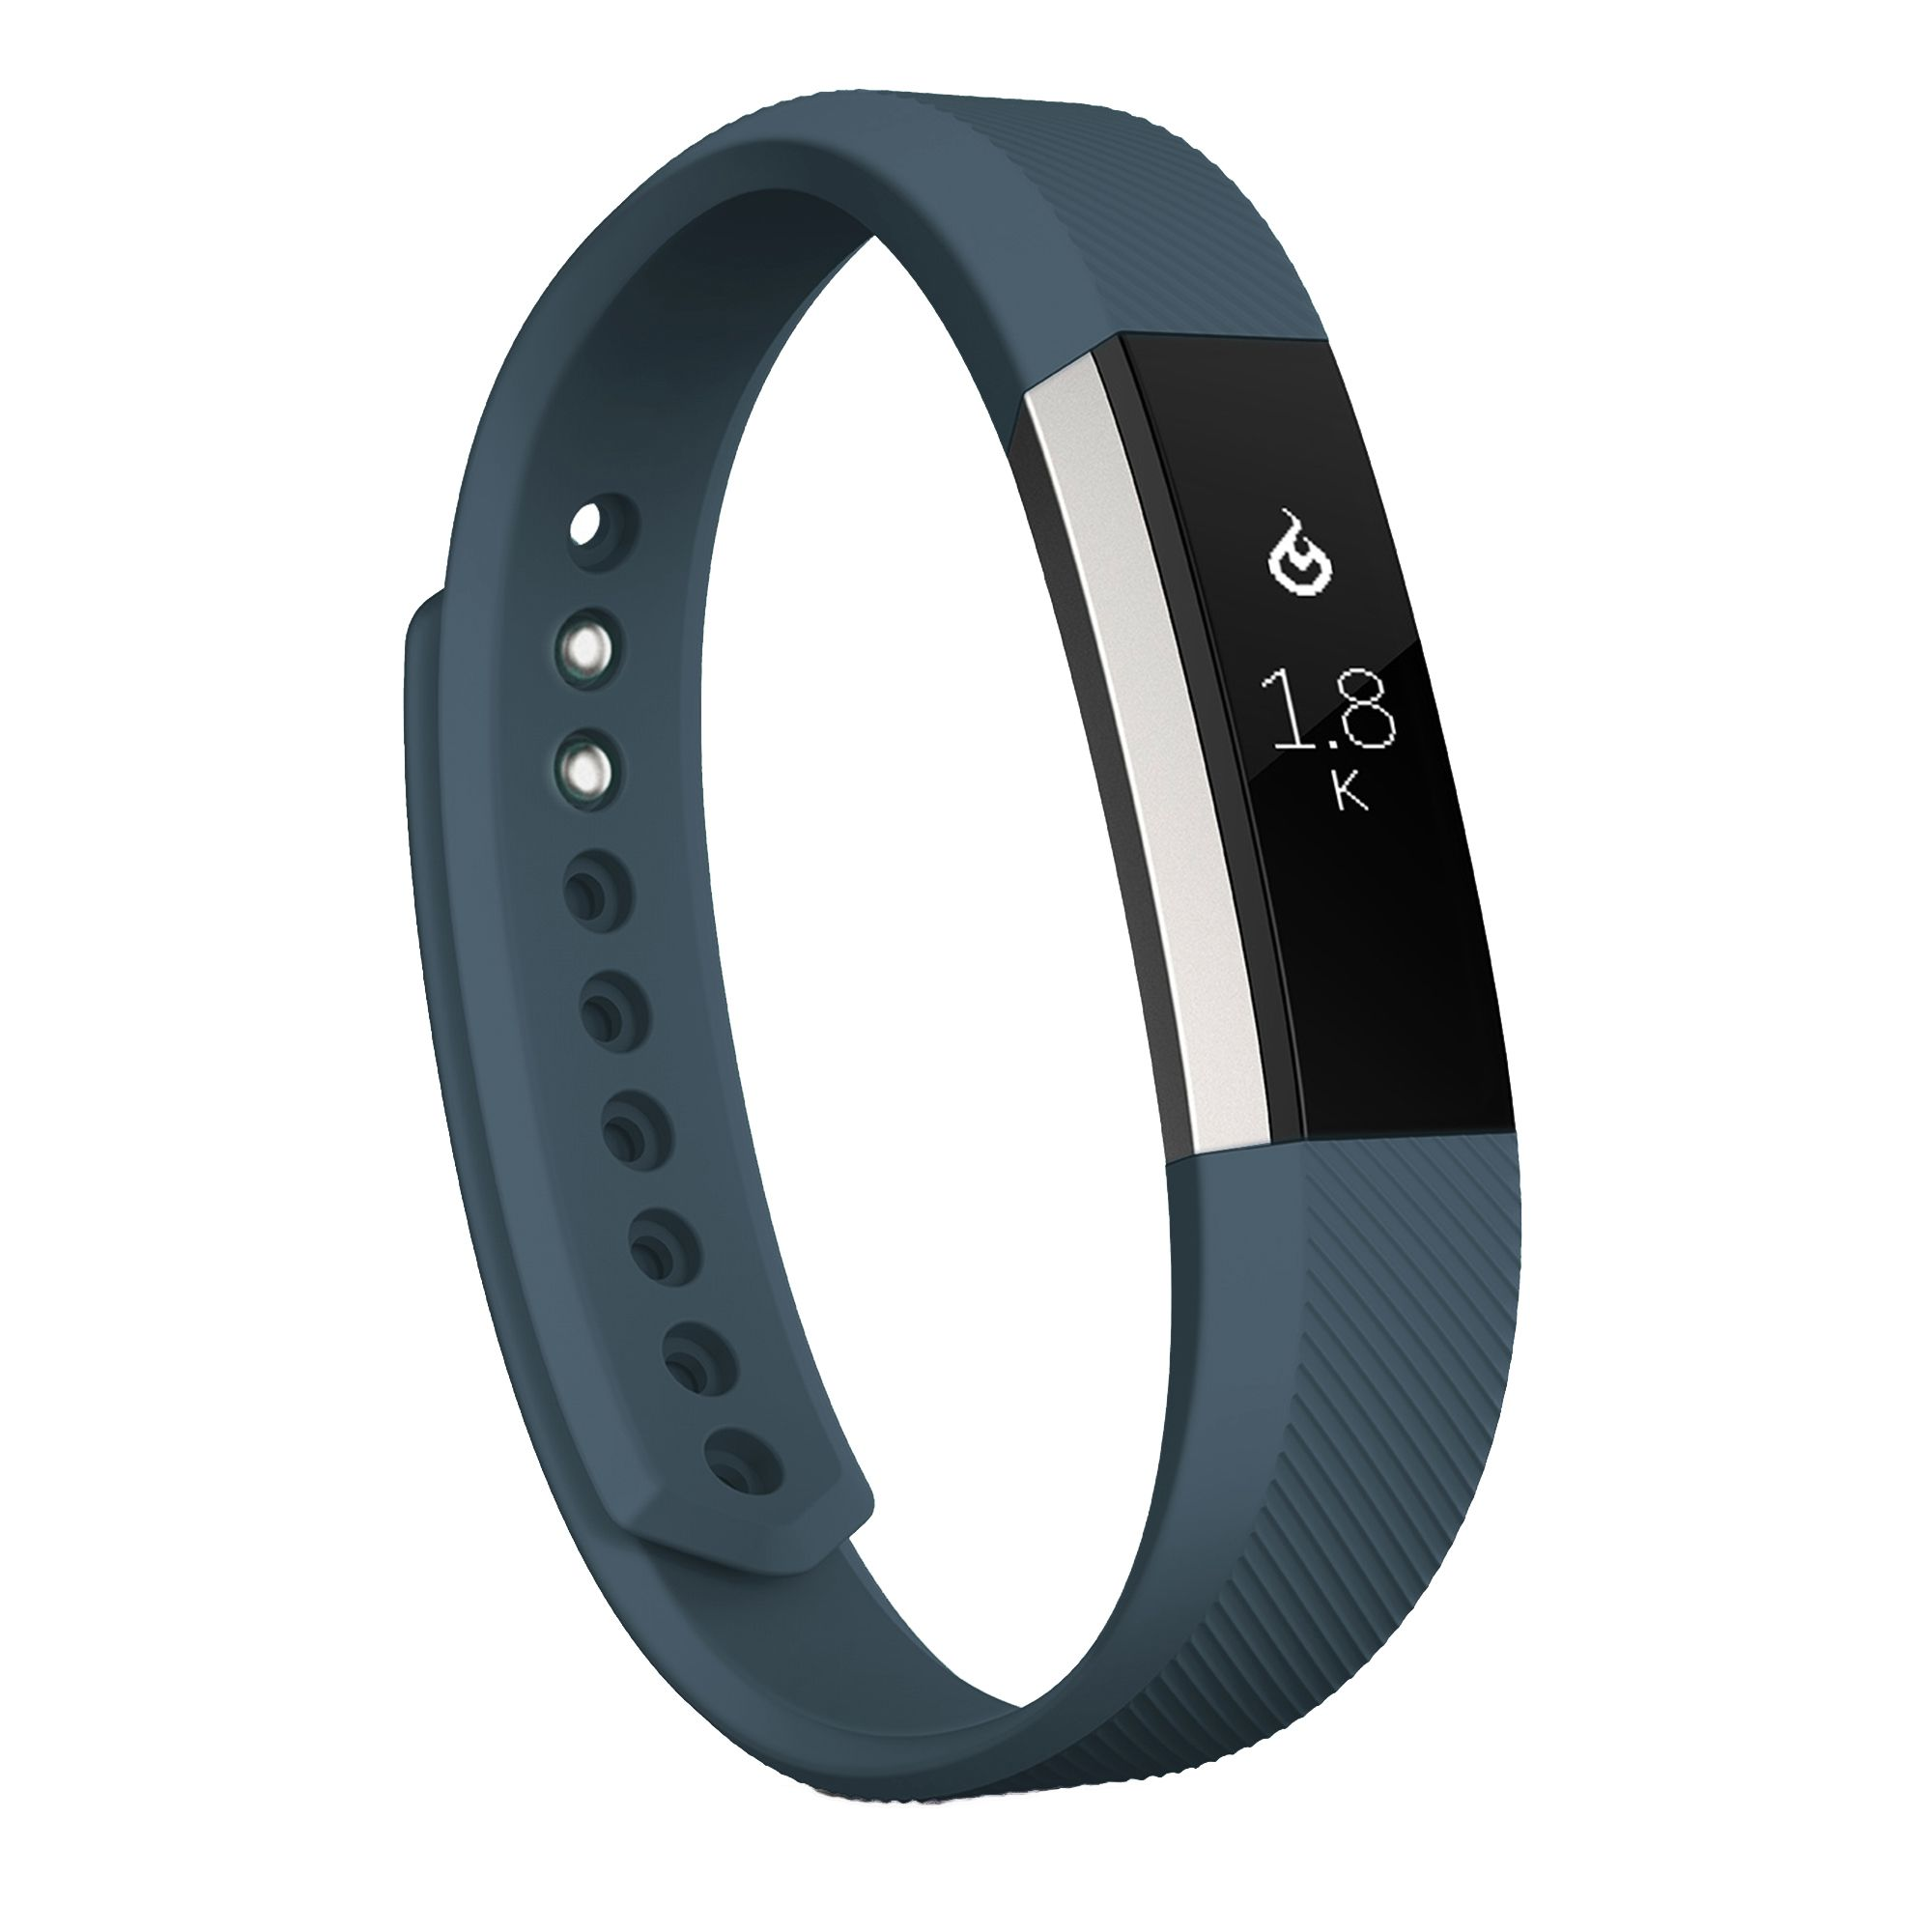 Zodaca Fitbit Alta - TPU Rubber Wristband Replacement Sports Watch Wrist Band Strap w/ Clasp